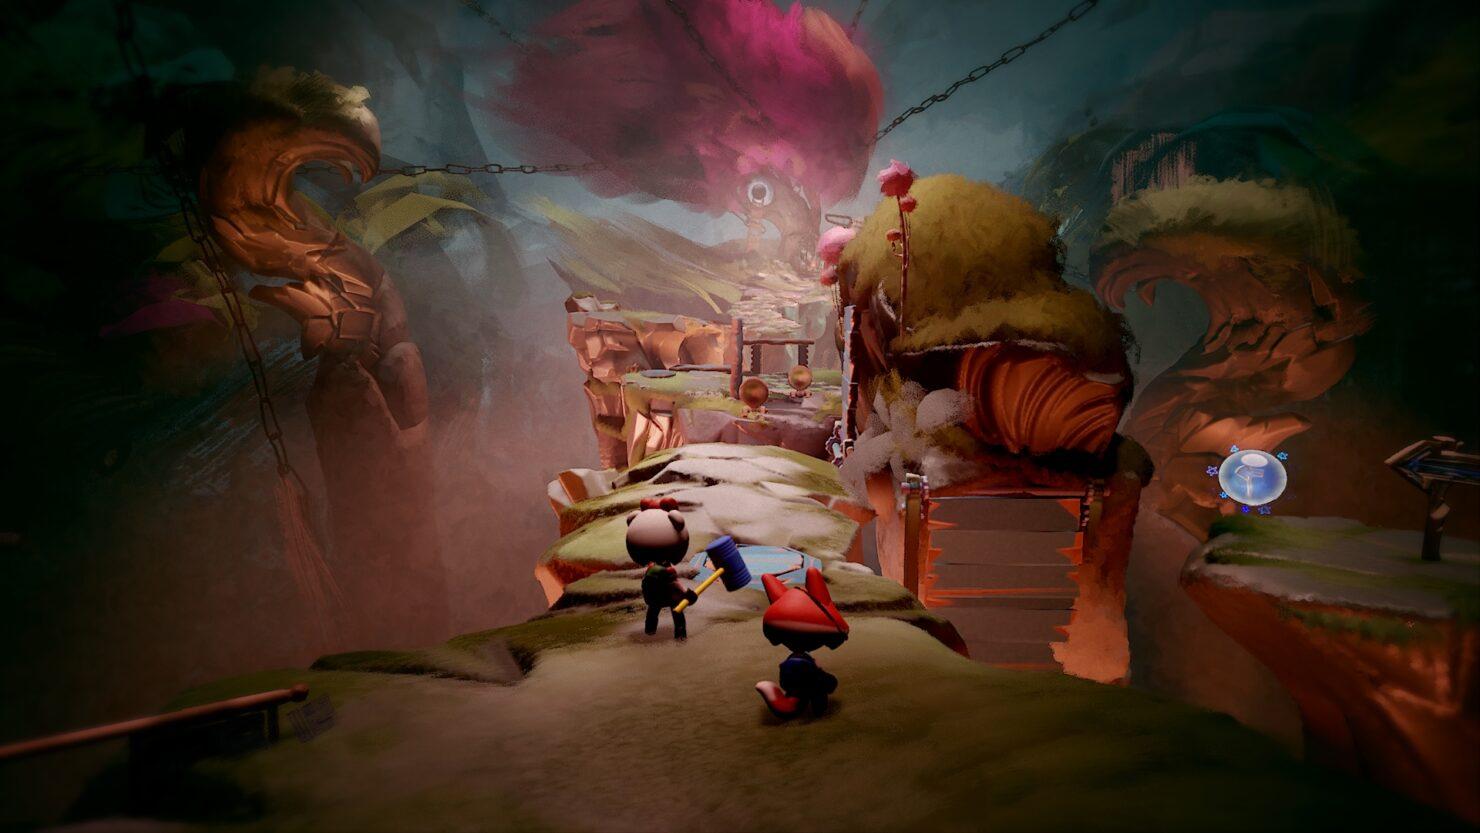 dreams-ps4-psx17-screenshot-06-childhood